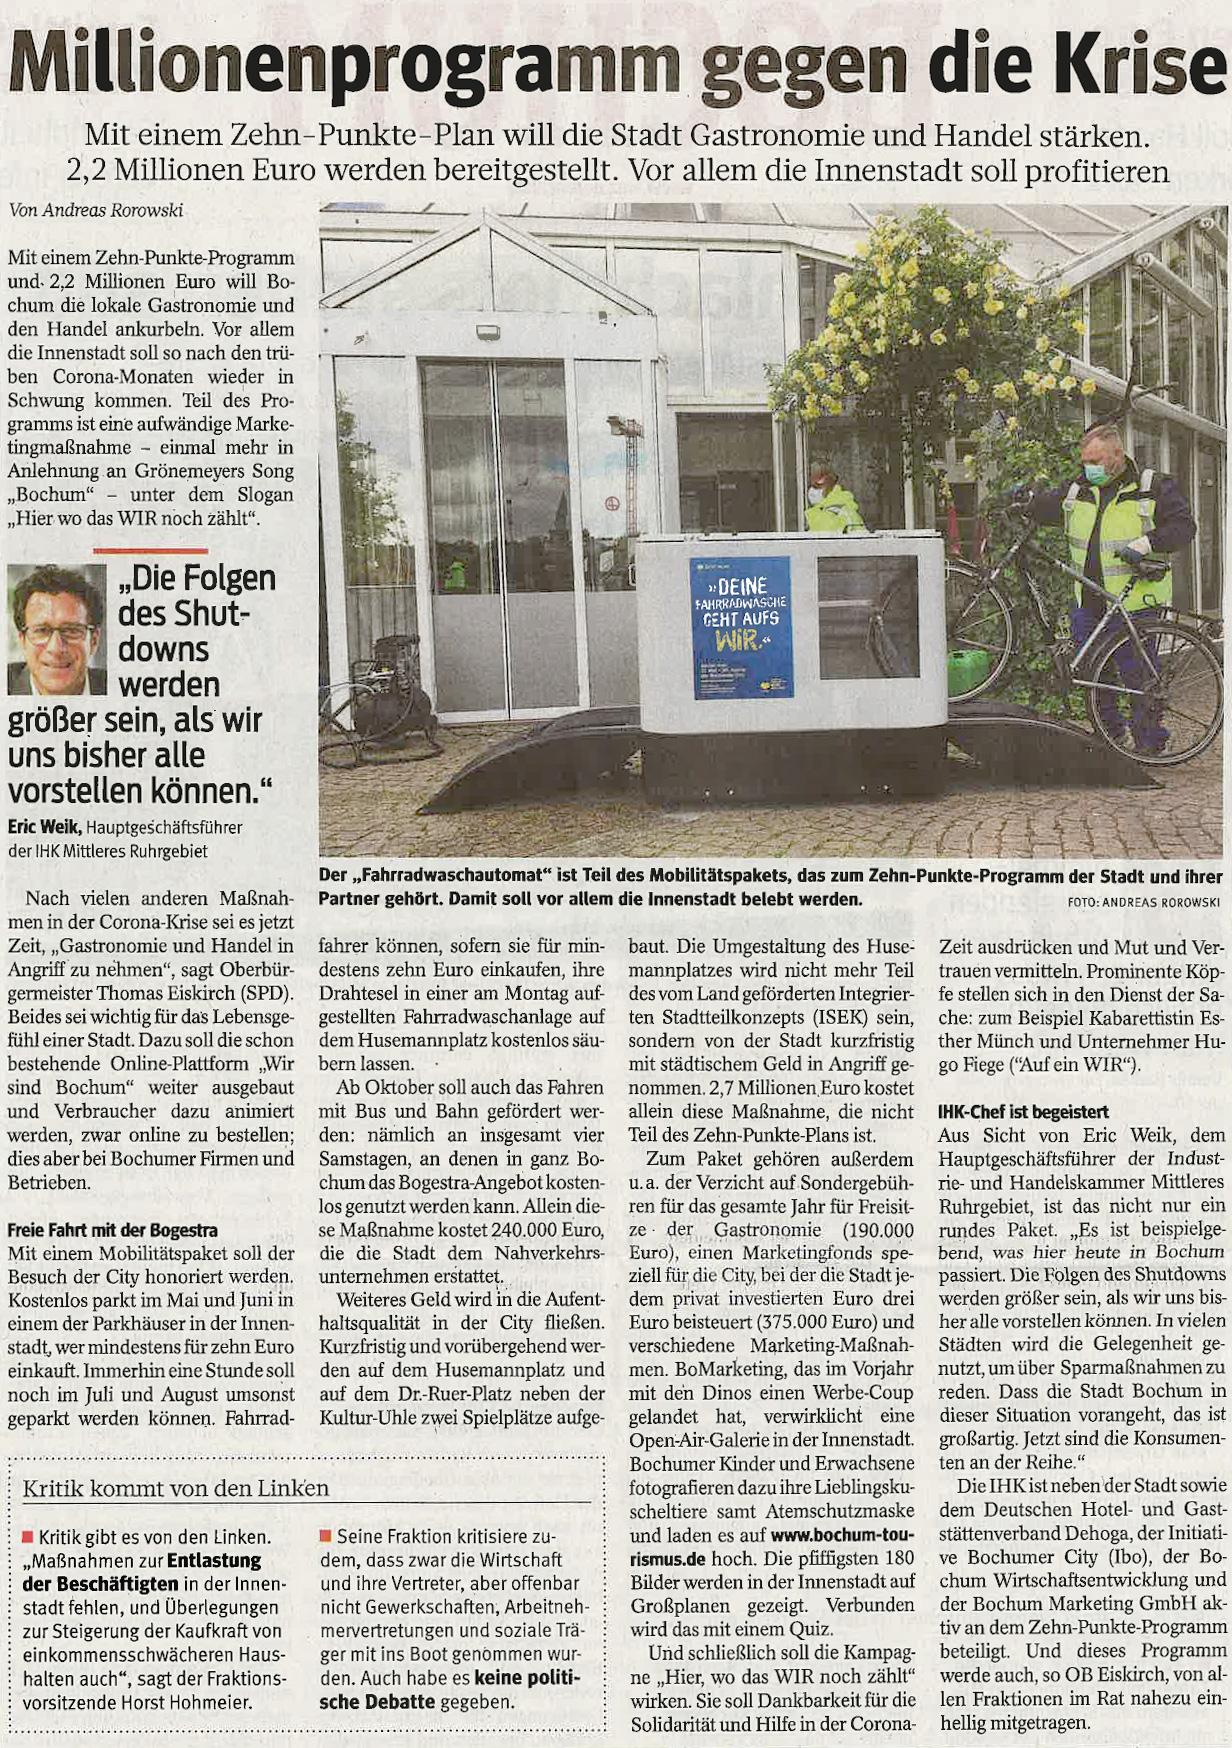 WAZ Bochum 12.05.2020